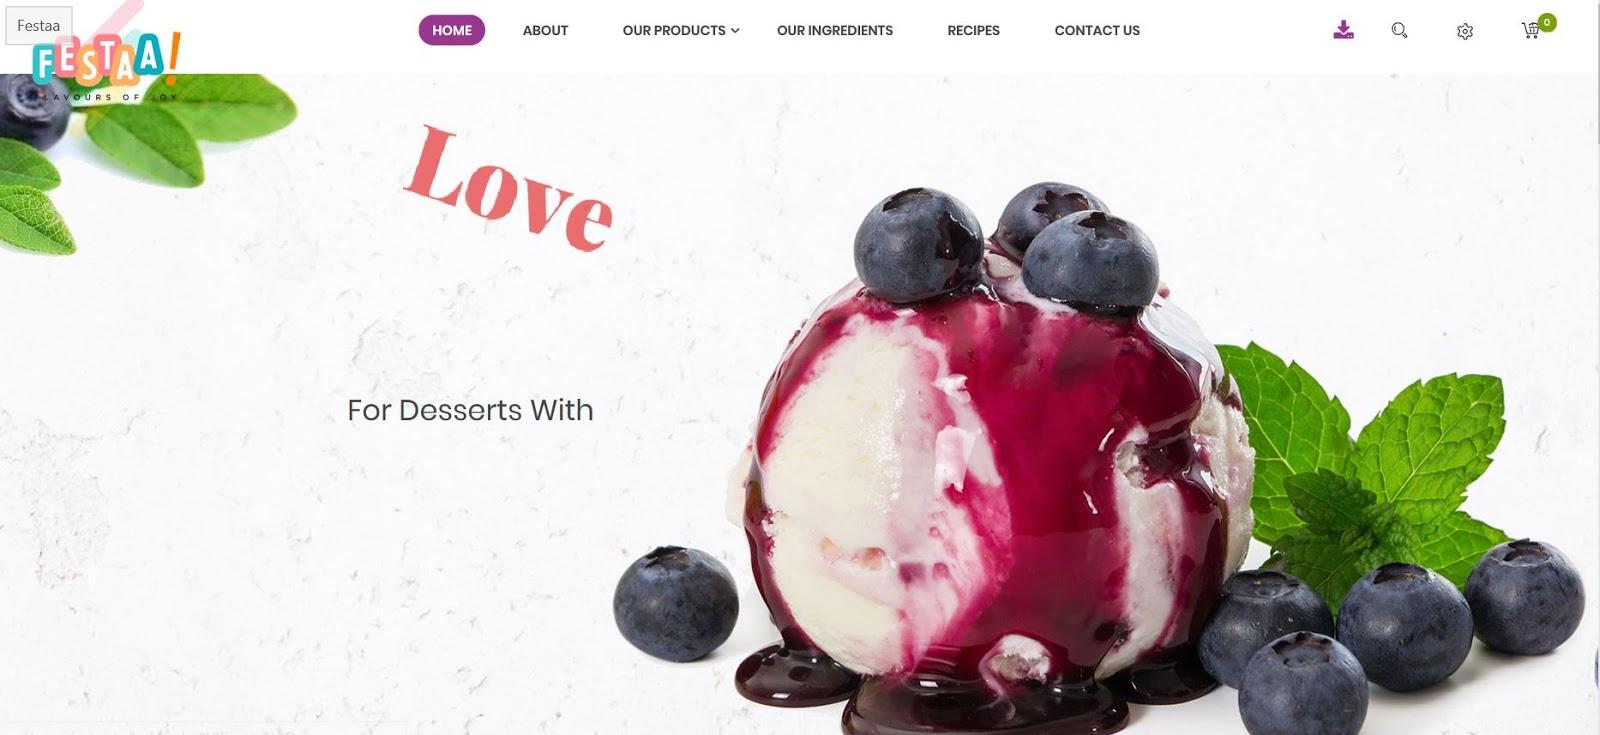 Blueberry FoodTech: Blueberry Innovation - India!